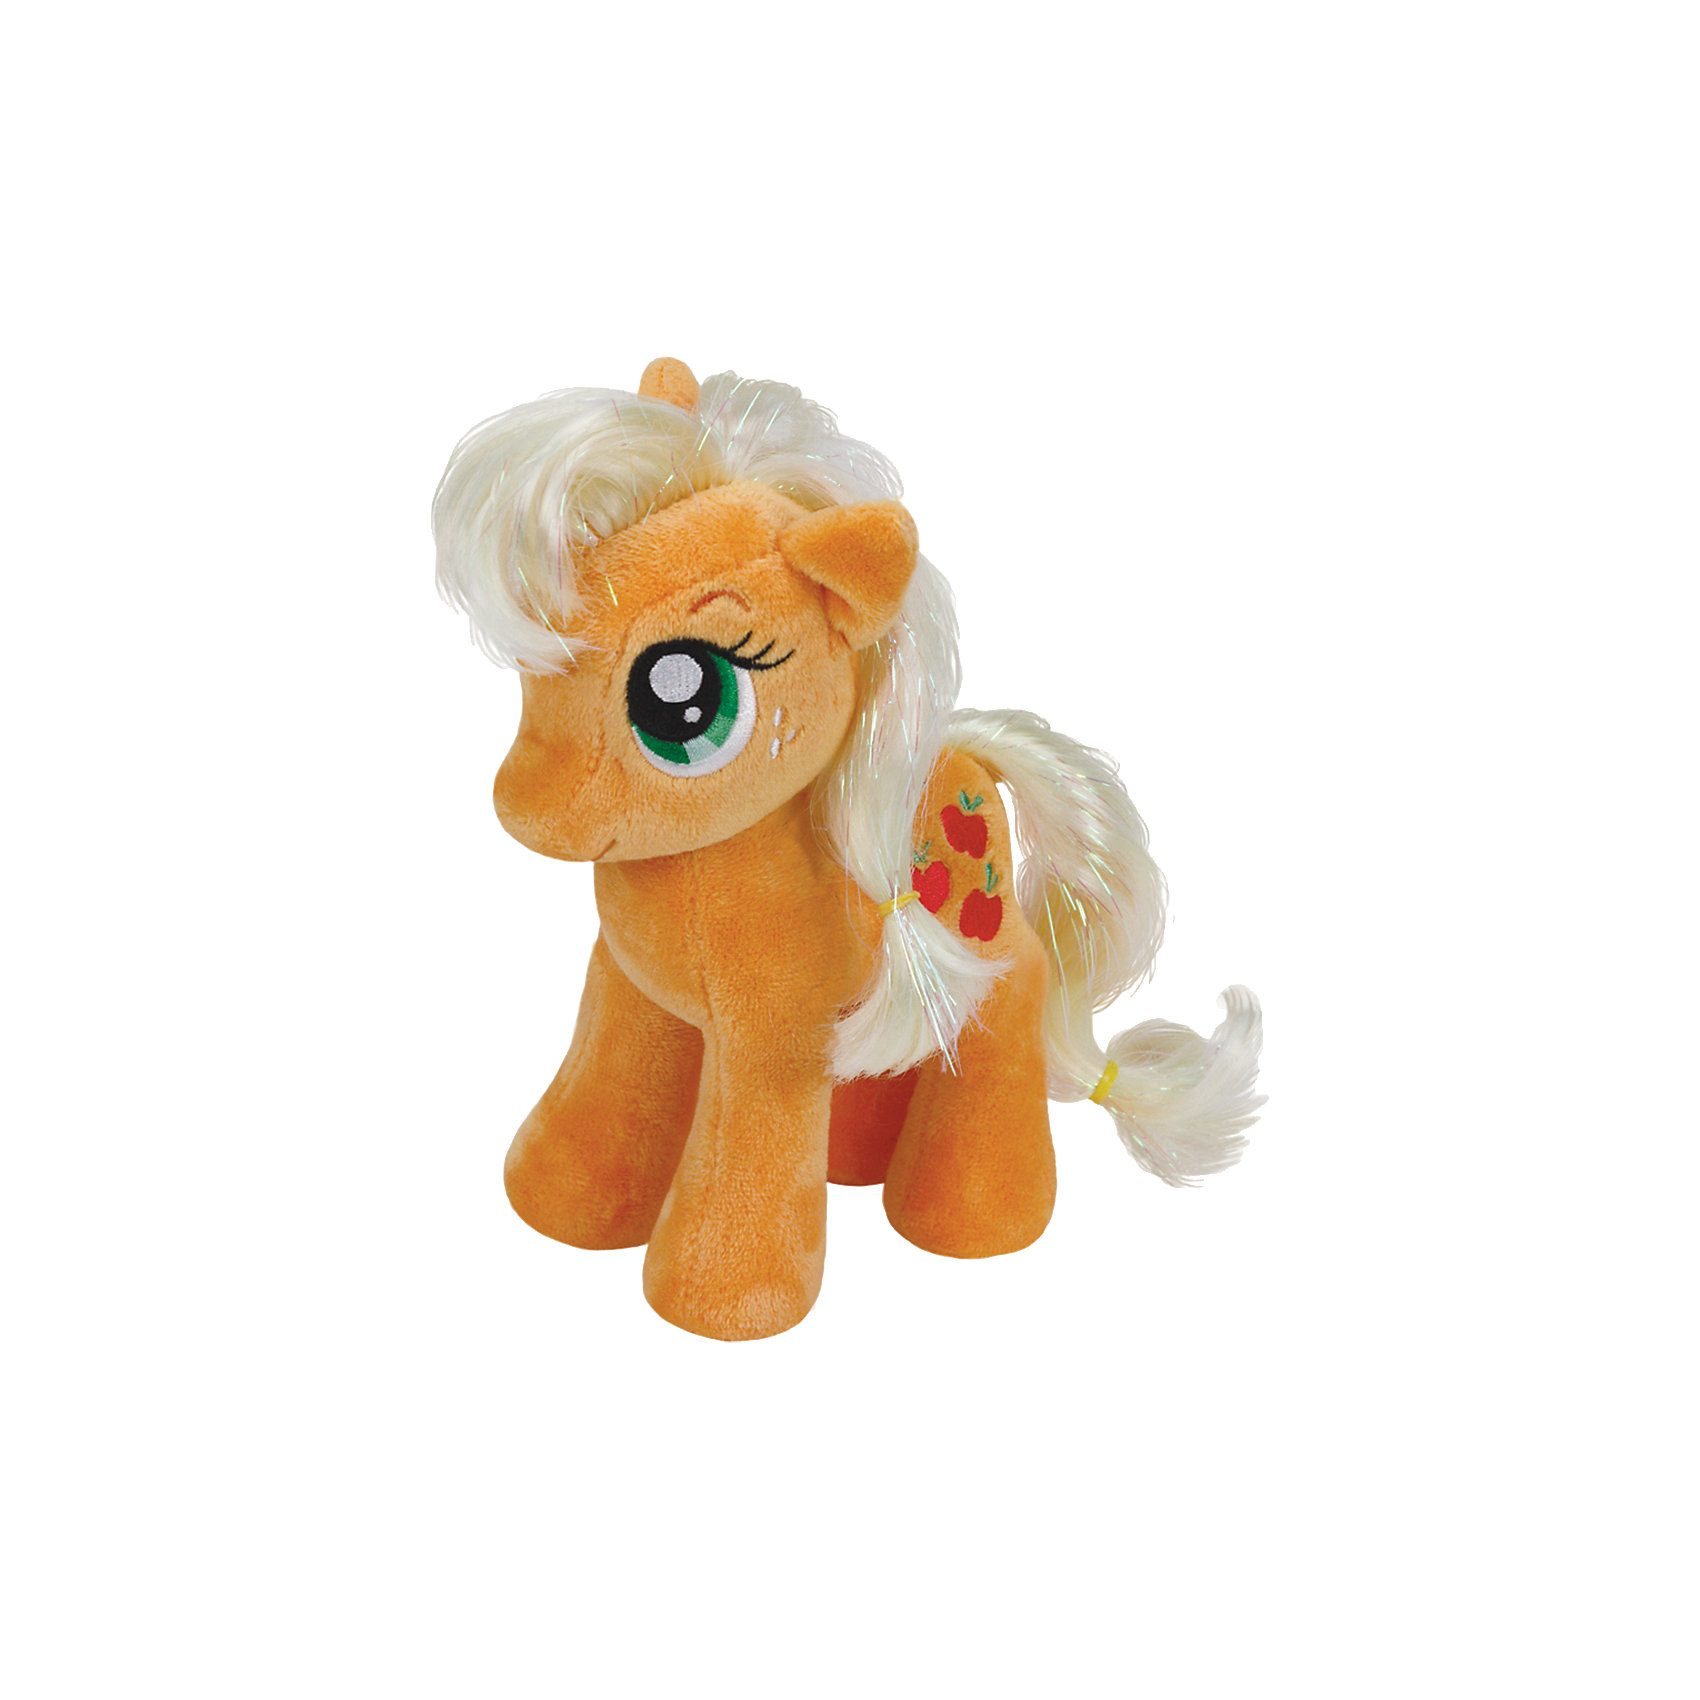 Ty My Little Pony Large - Applejack, 24cm